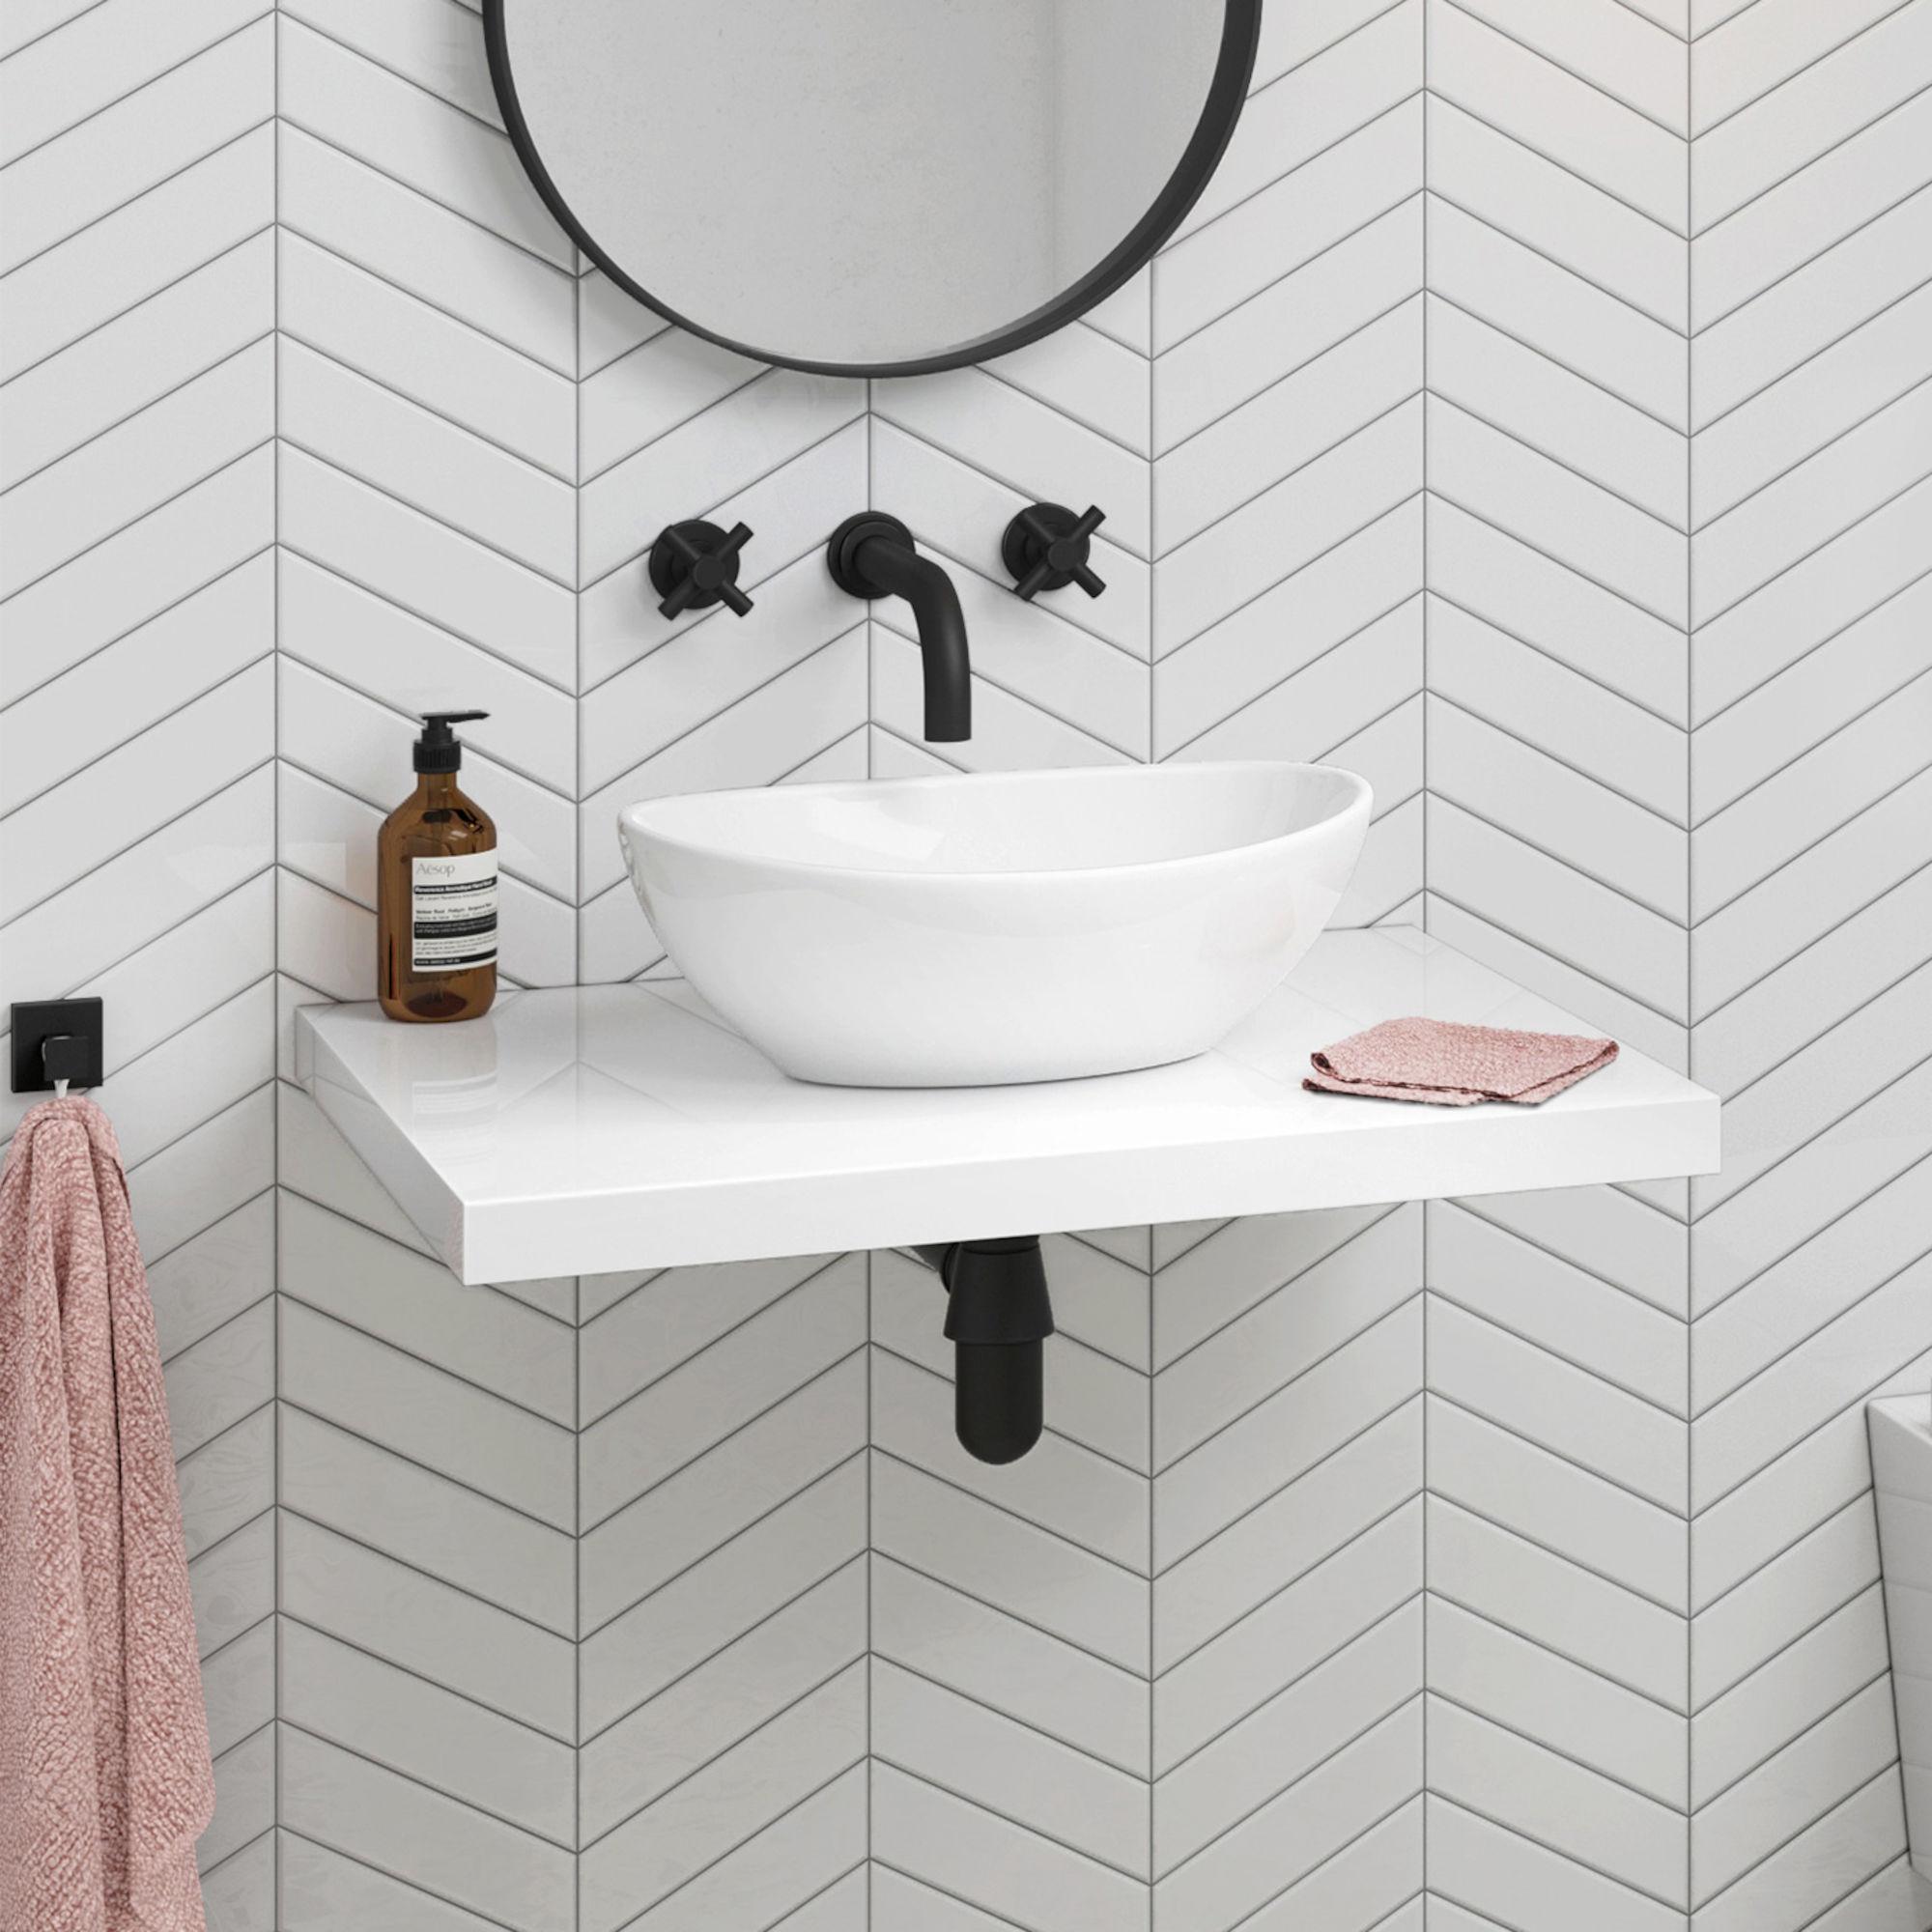 Bathroom Basin Floating Shelf Grottepastenaecollepardo